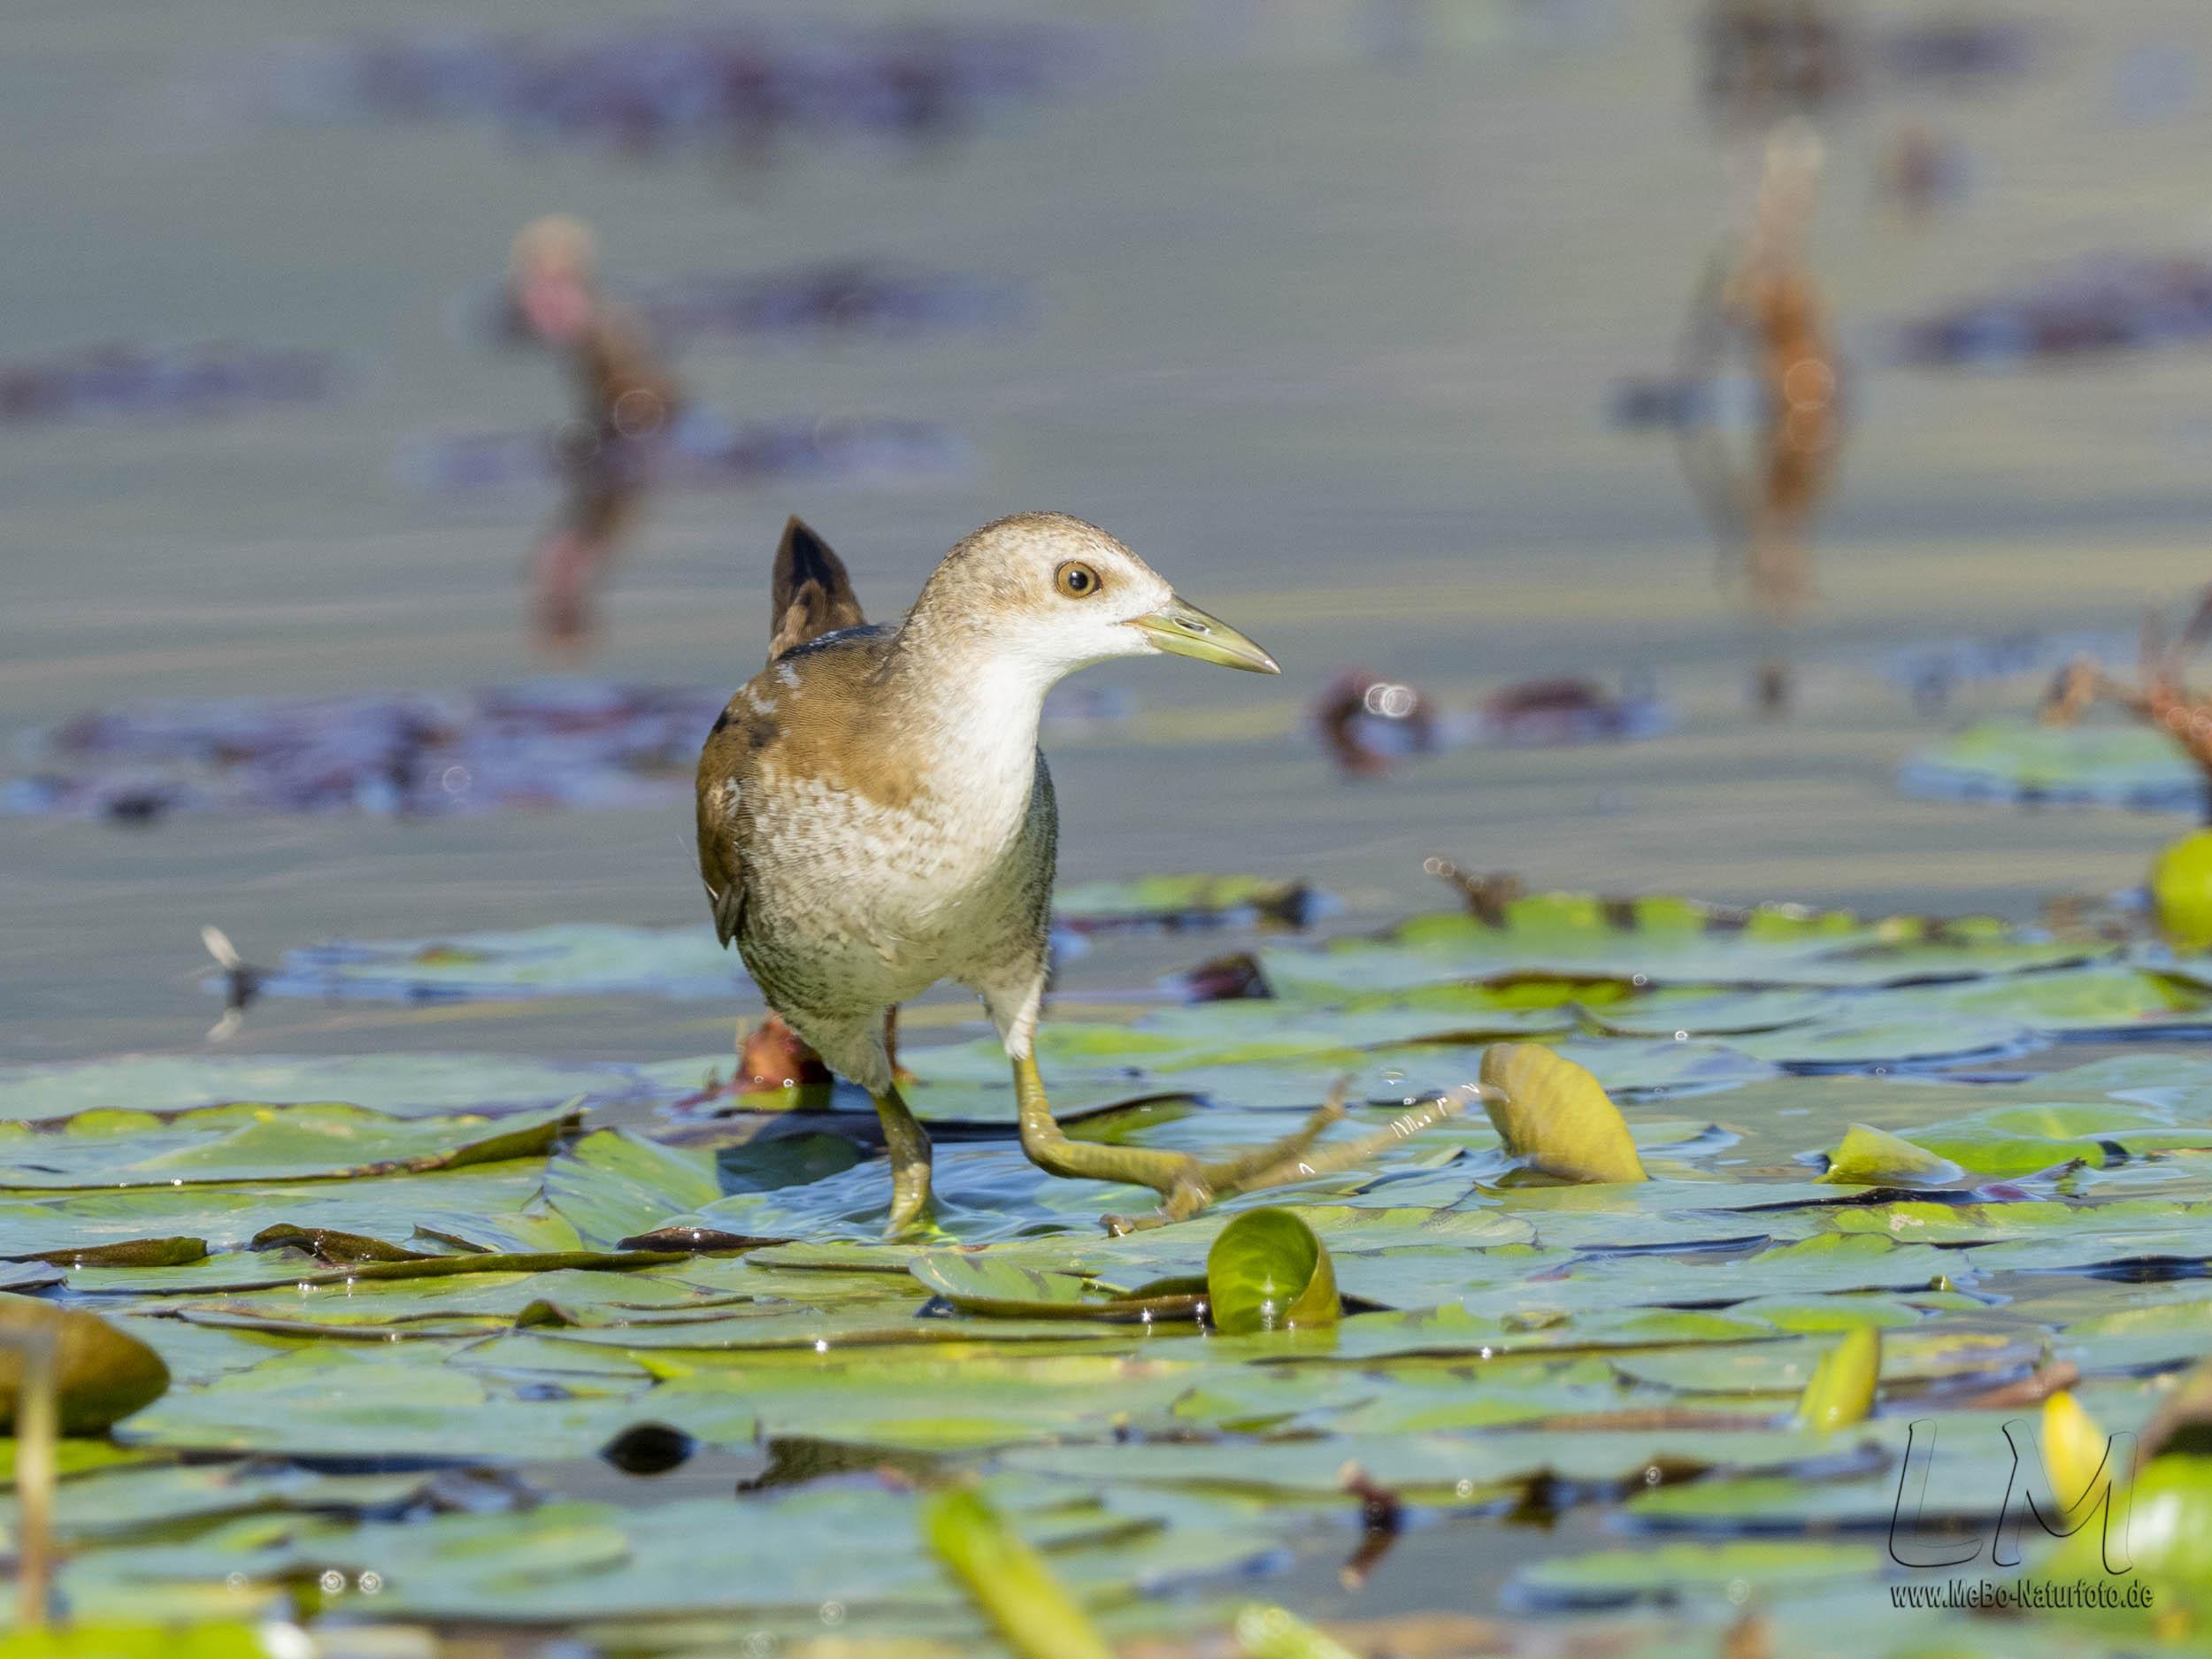 Kleines Sumpfhuhn, Jungvogel